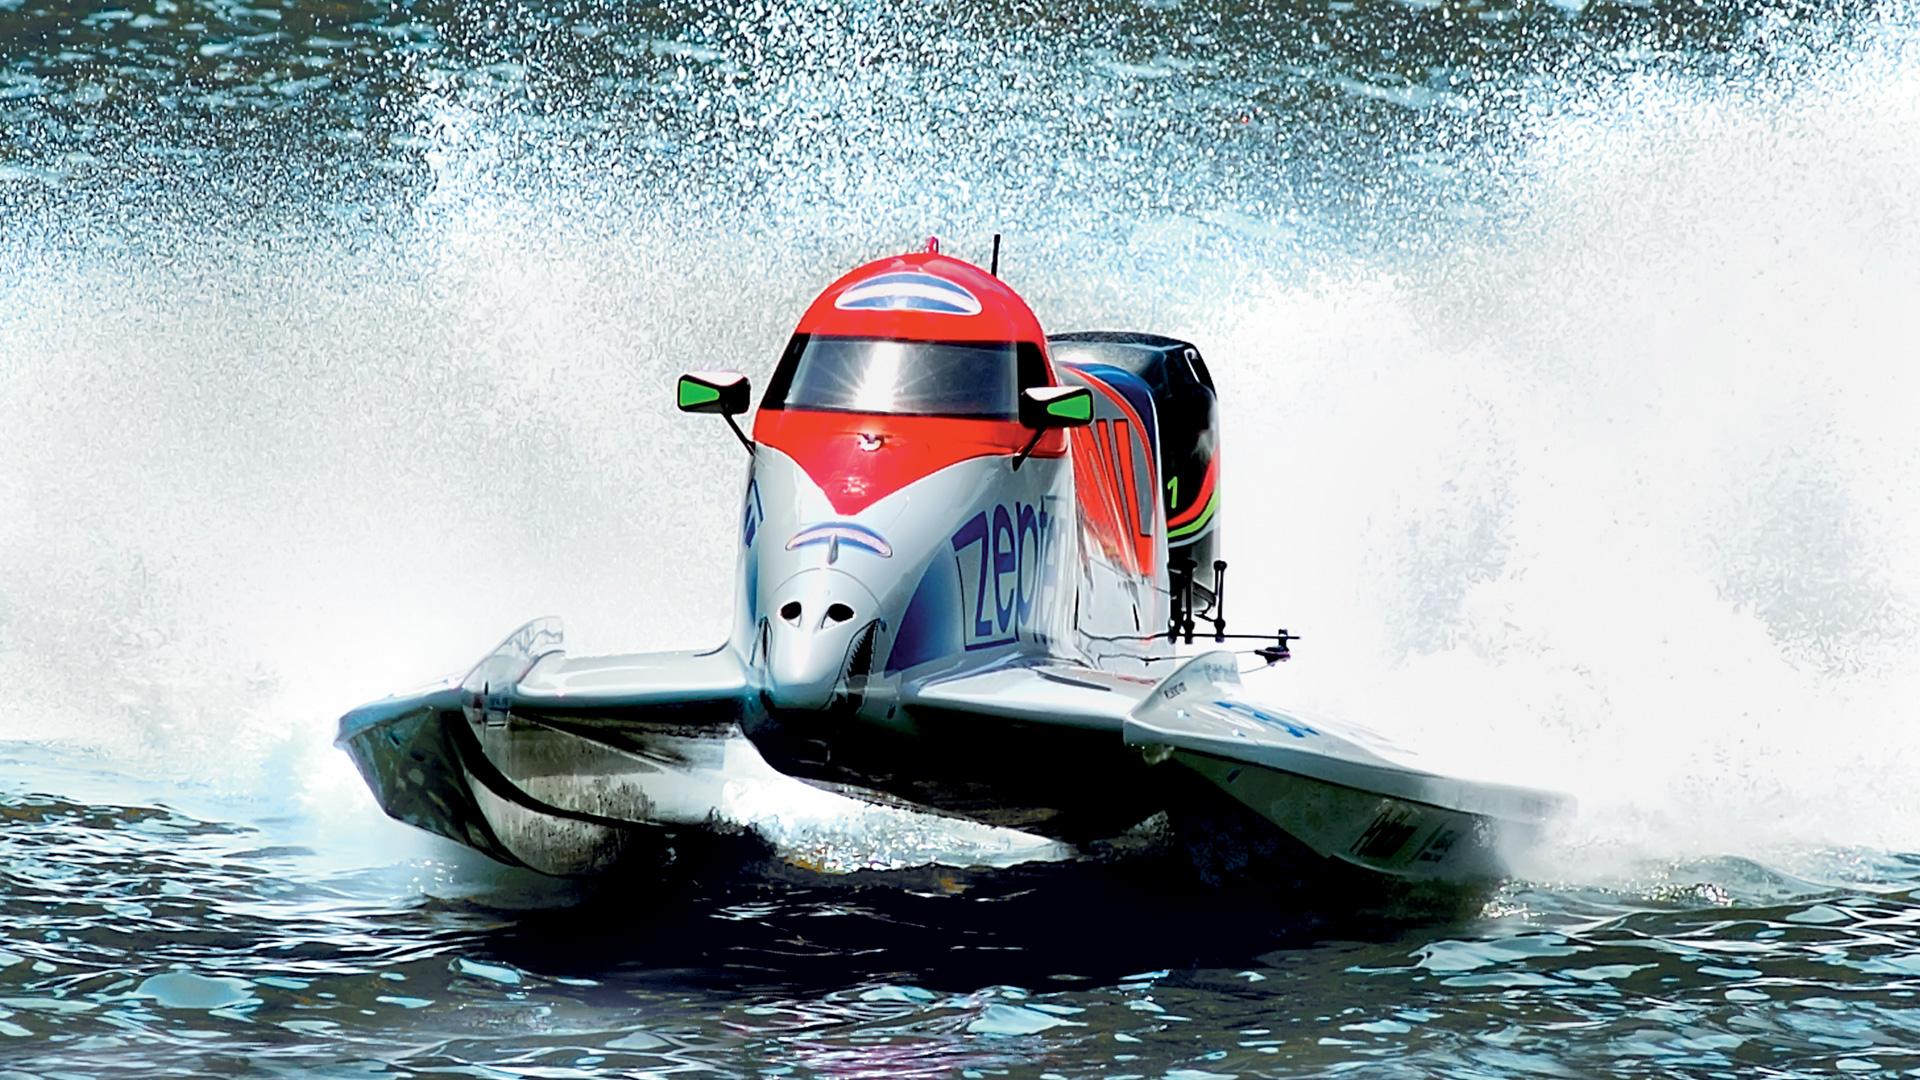 Motorsport high power